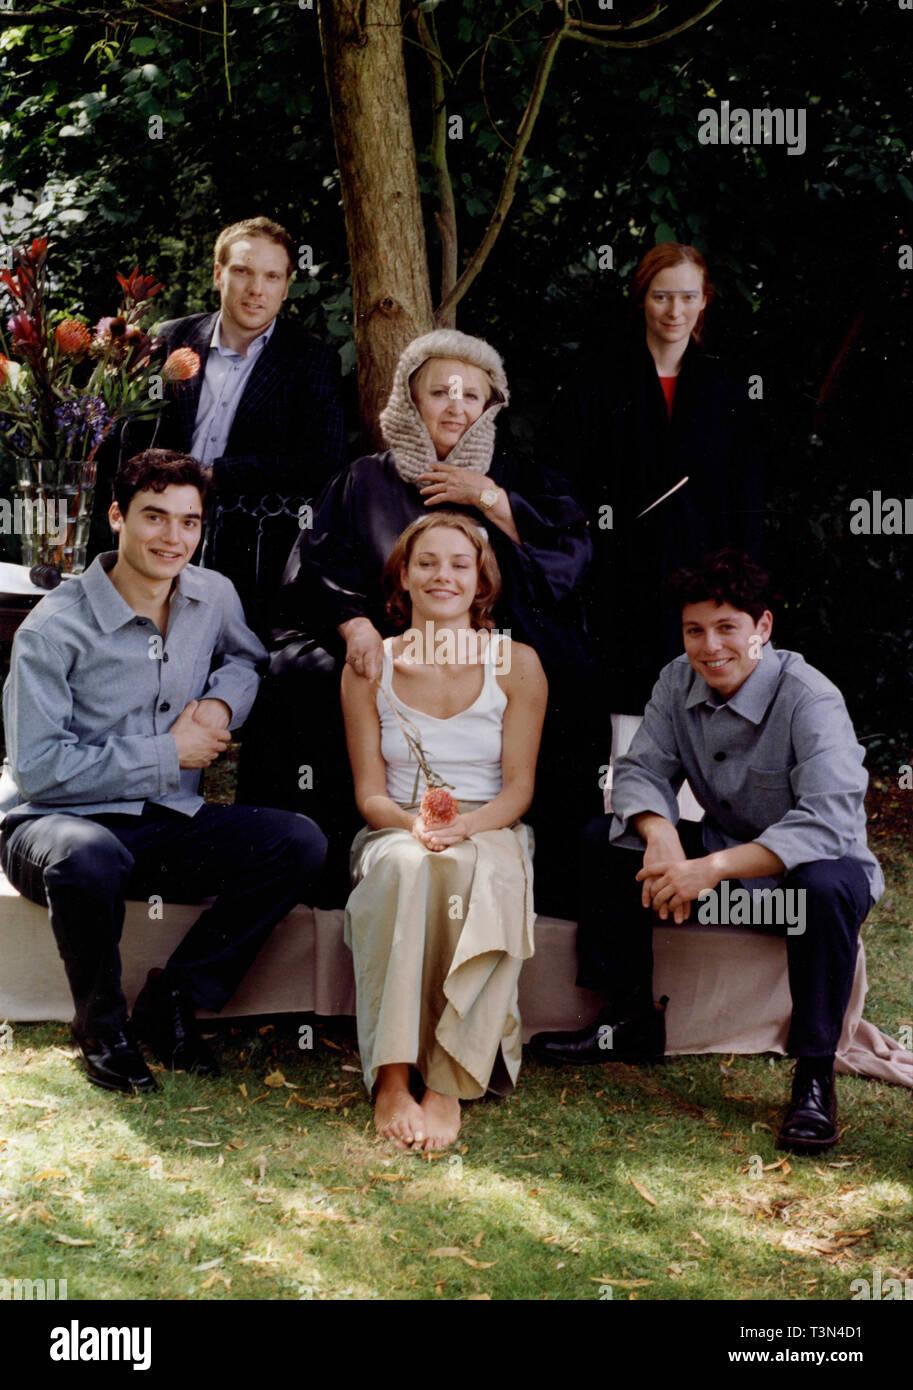 T. acteurs Swinton, F. Sacchi, A., & Tierman C. Gioè, P. Briguglia, L. Betti dans le film le protagoniste, années 90 Photo Stock